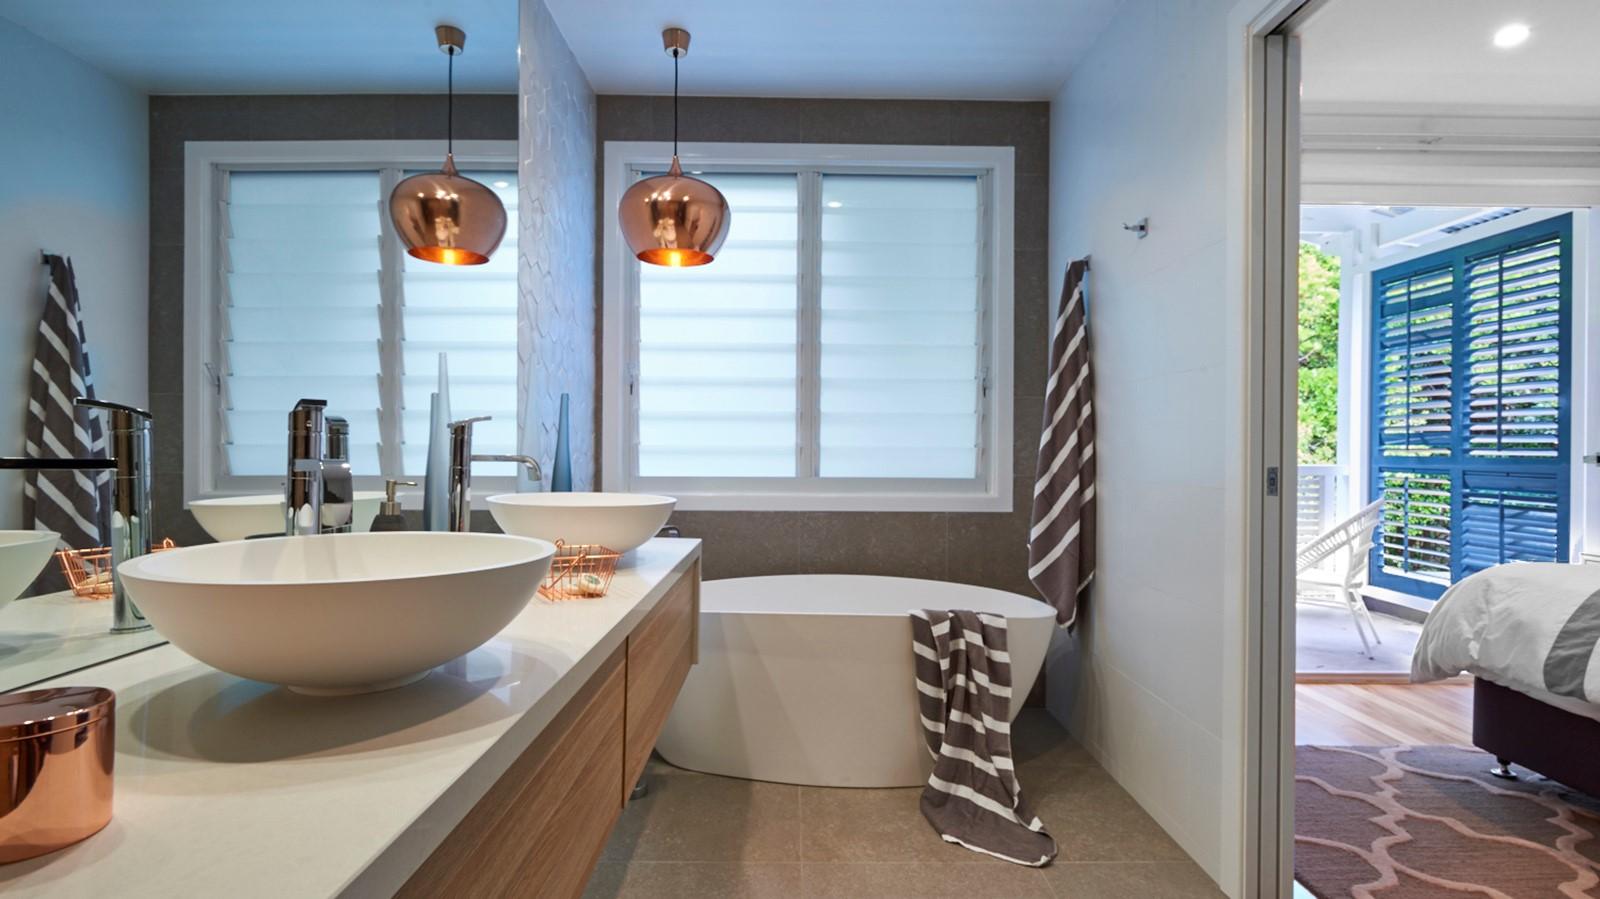 BATH — Boulevard Home Interiors | Interior design firm in California